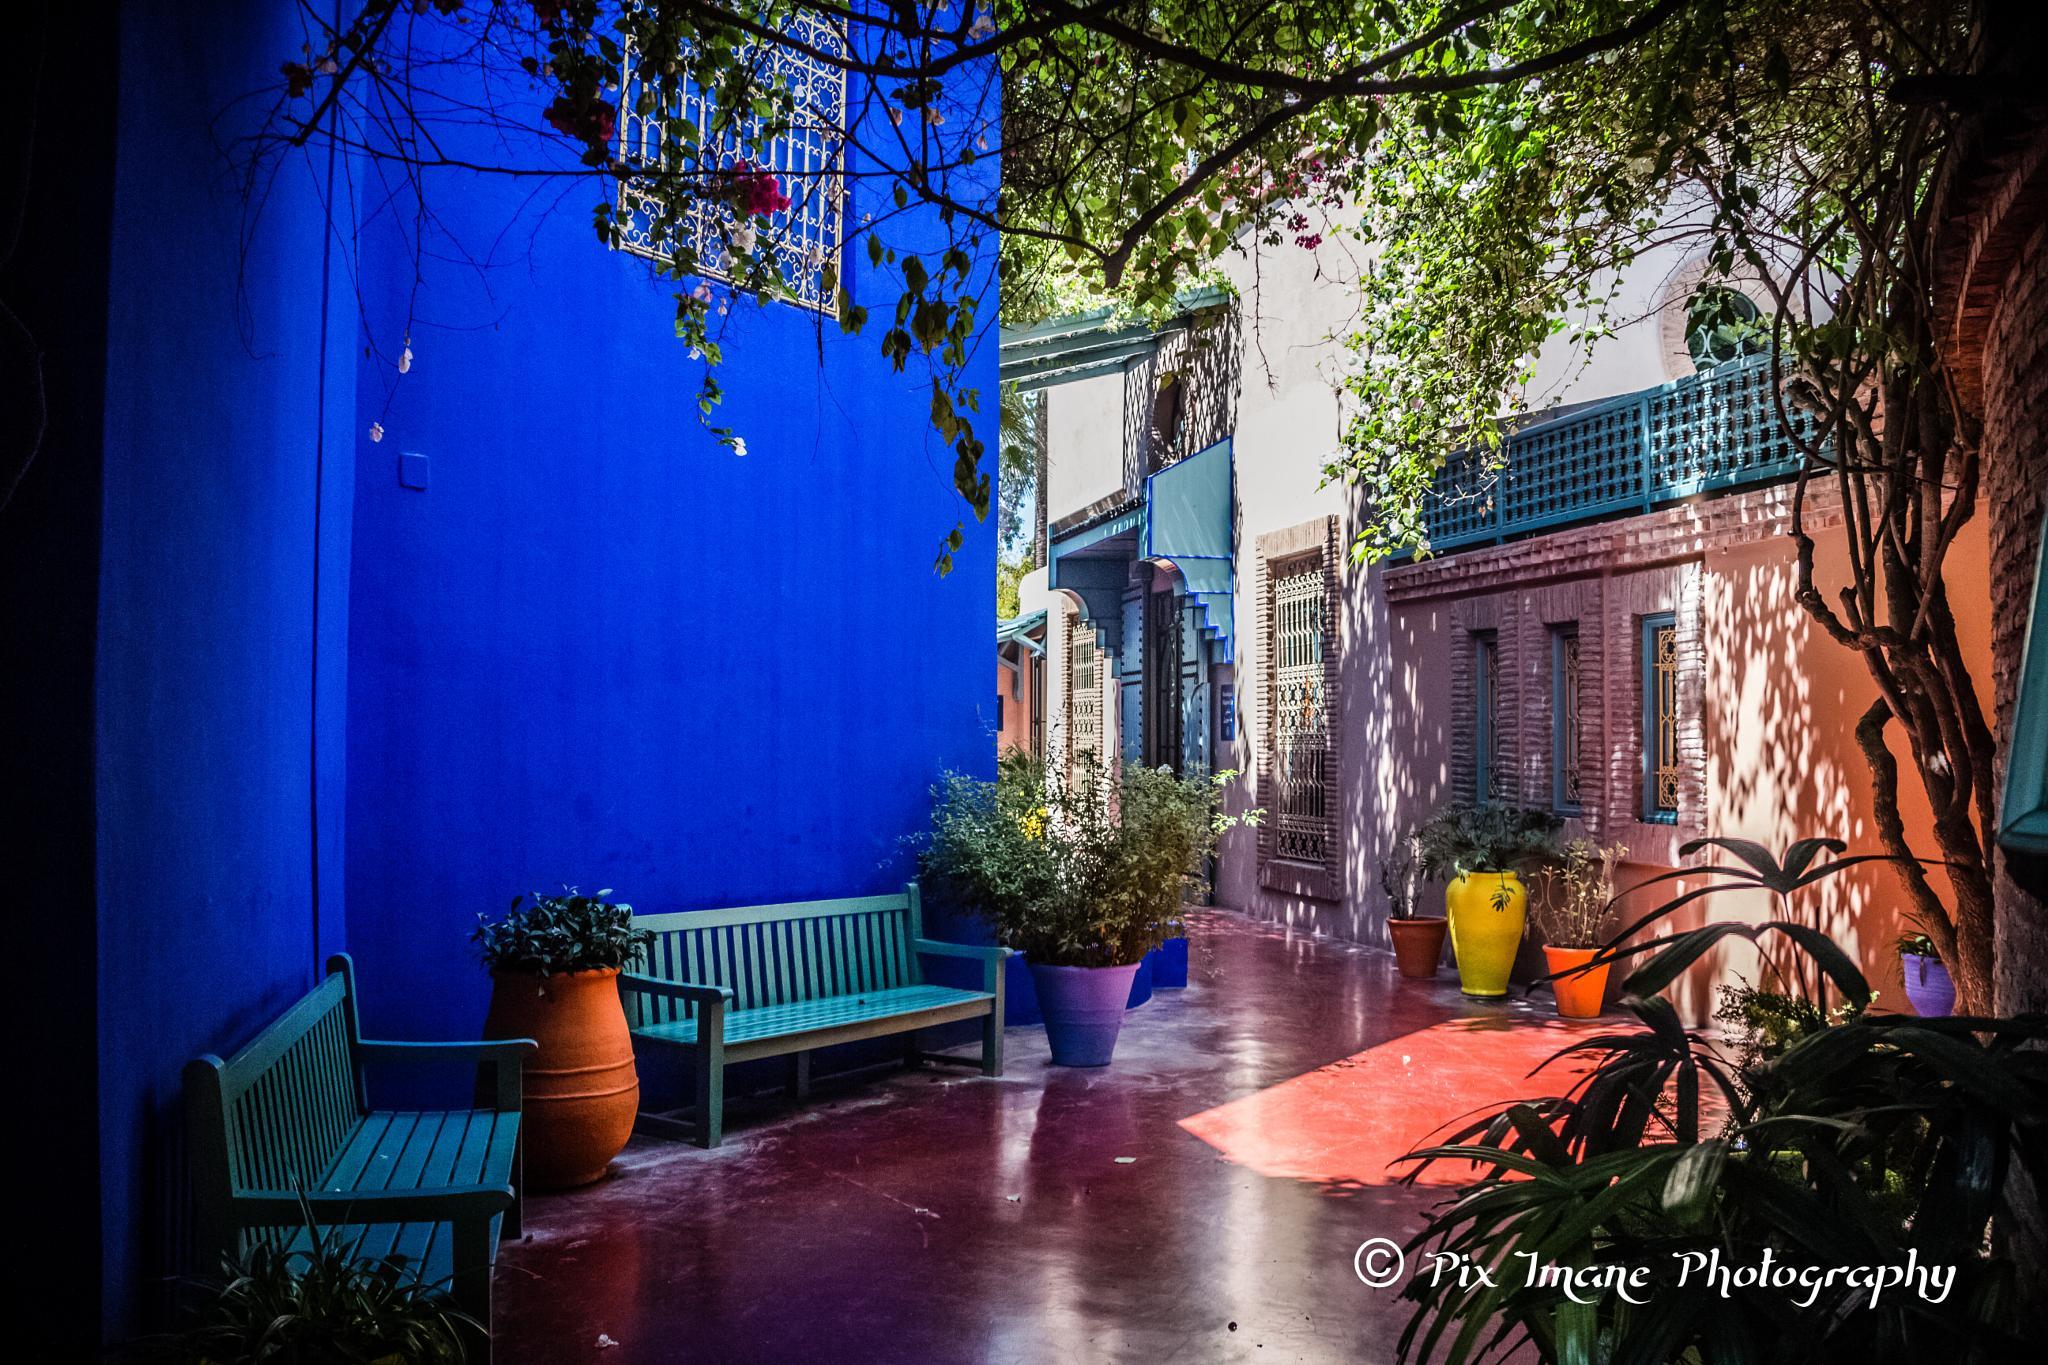 Jardin Majorelle Marrakech Morocco by PixImane Photography